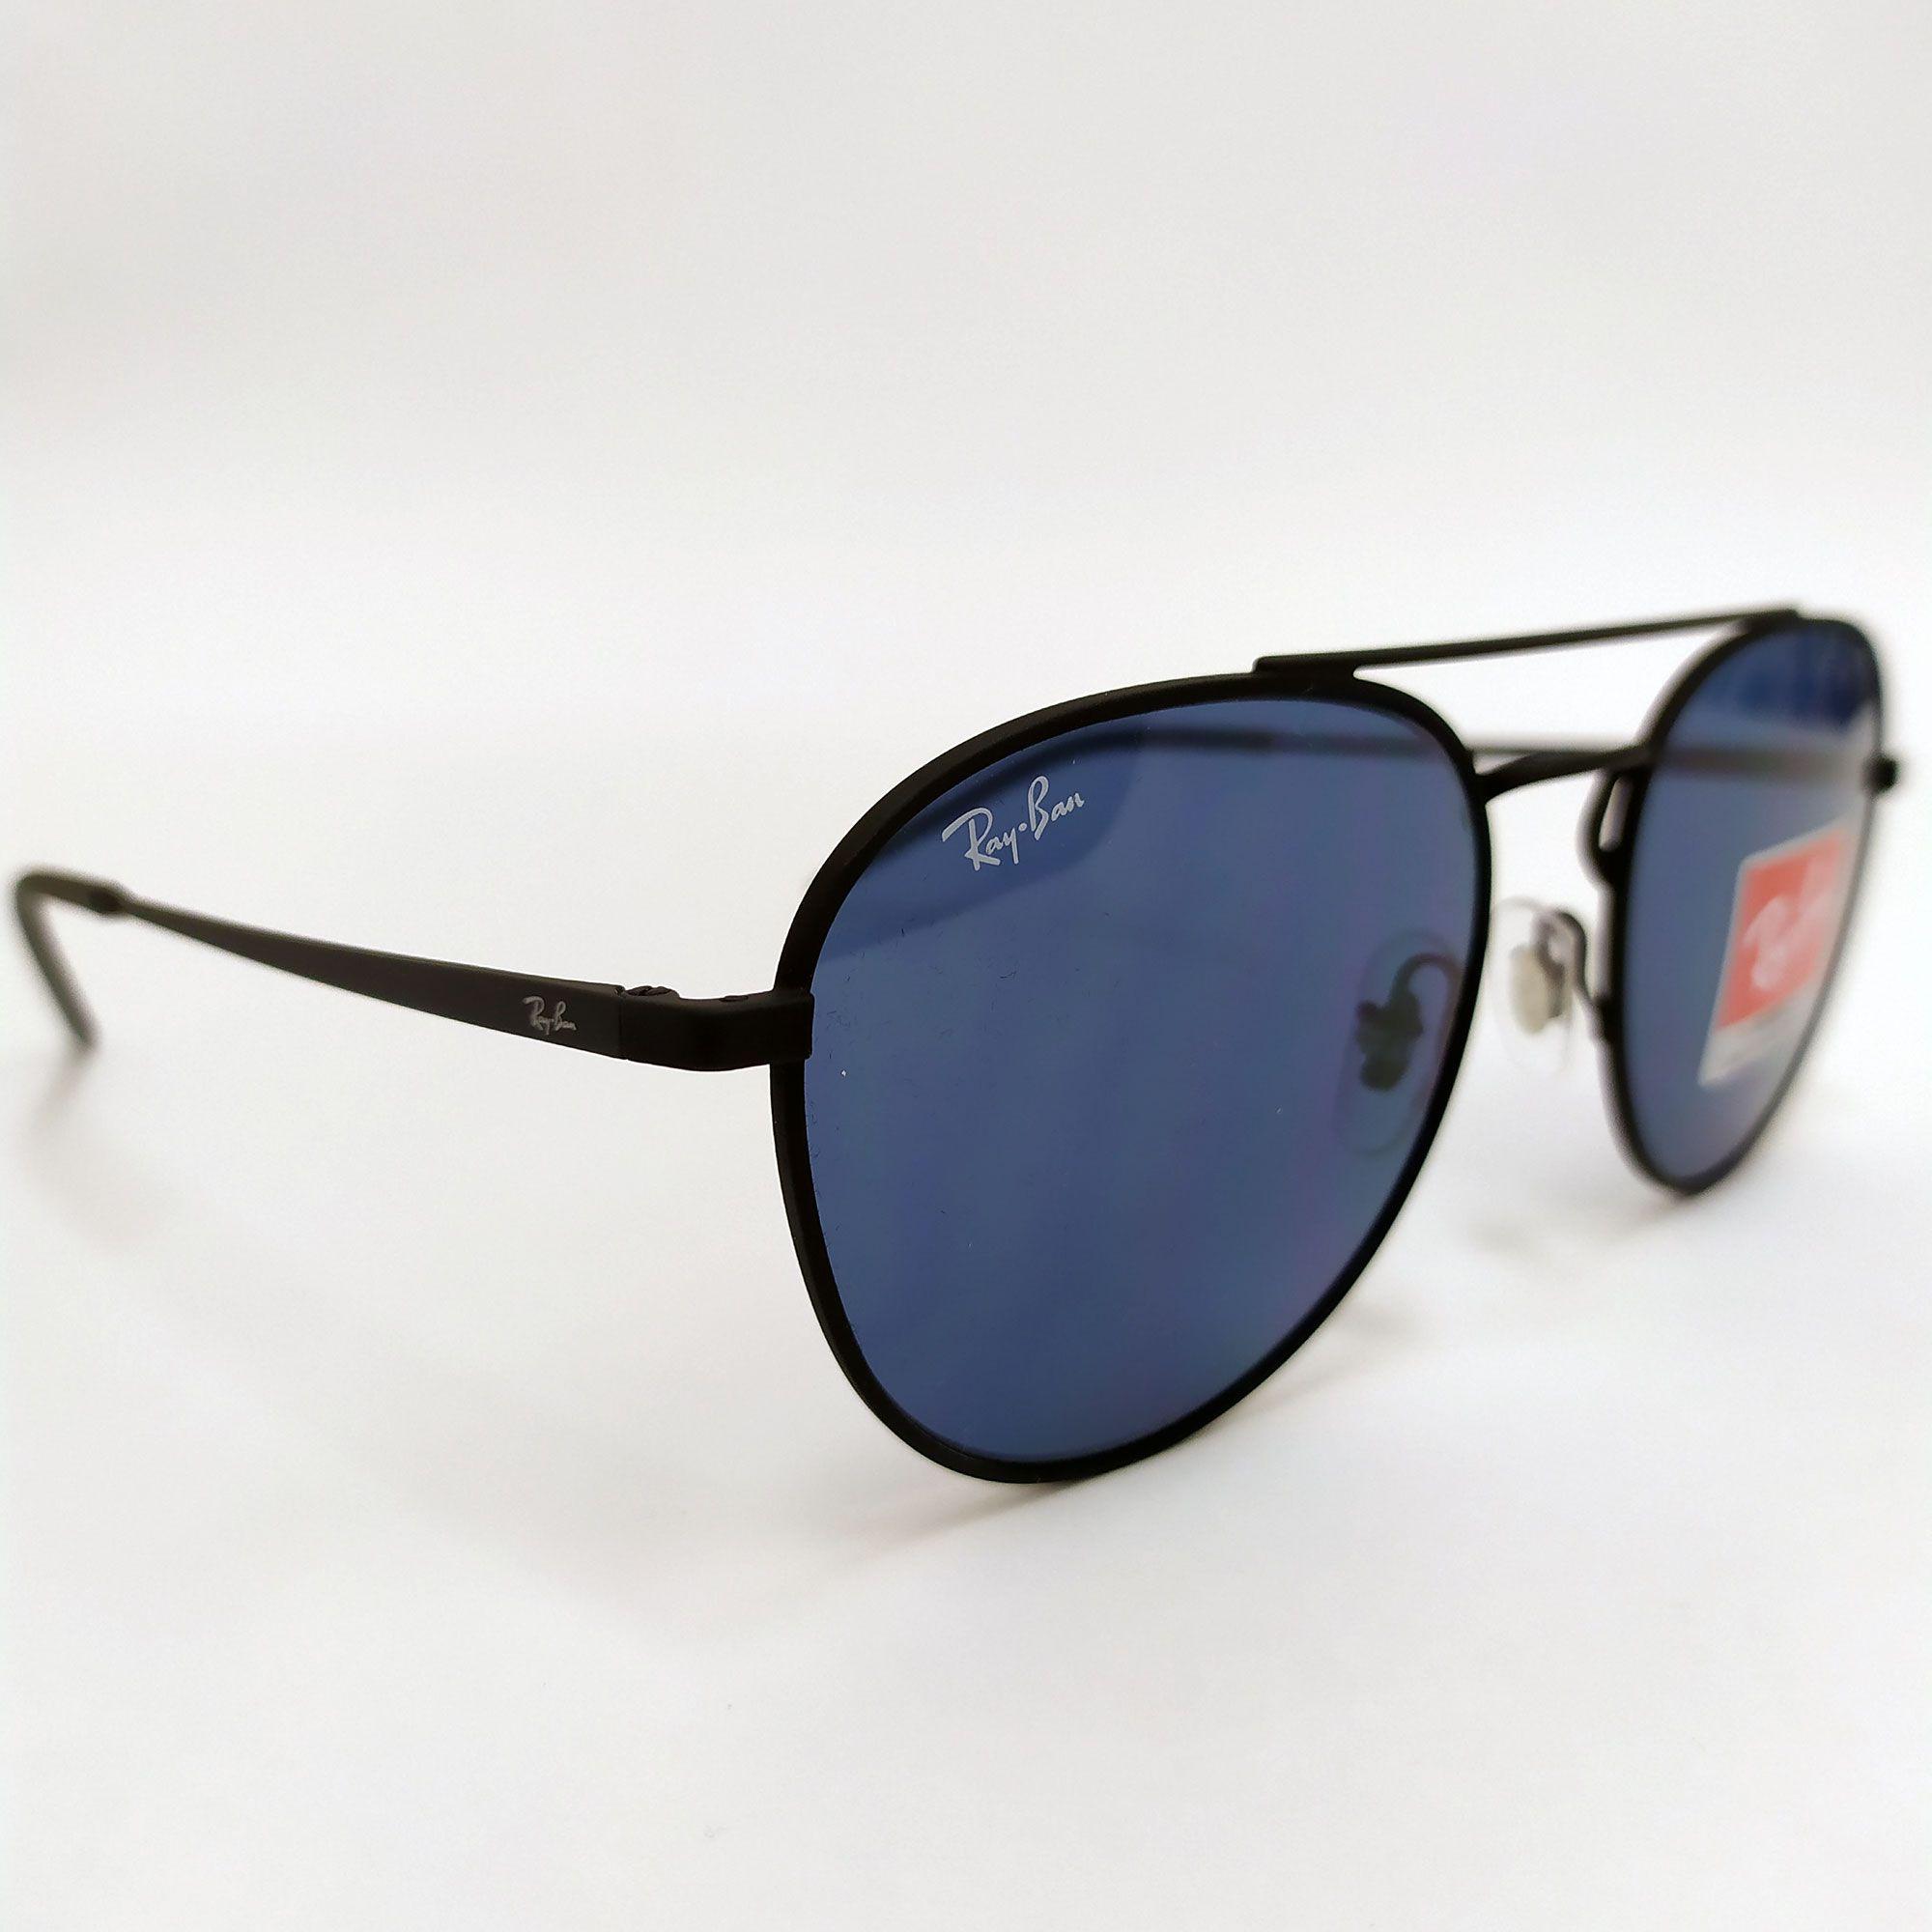 Óculos de Sol Ray-Ban  Preto com Lente Azul Clássica 3589